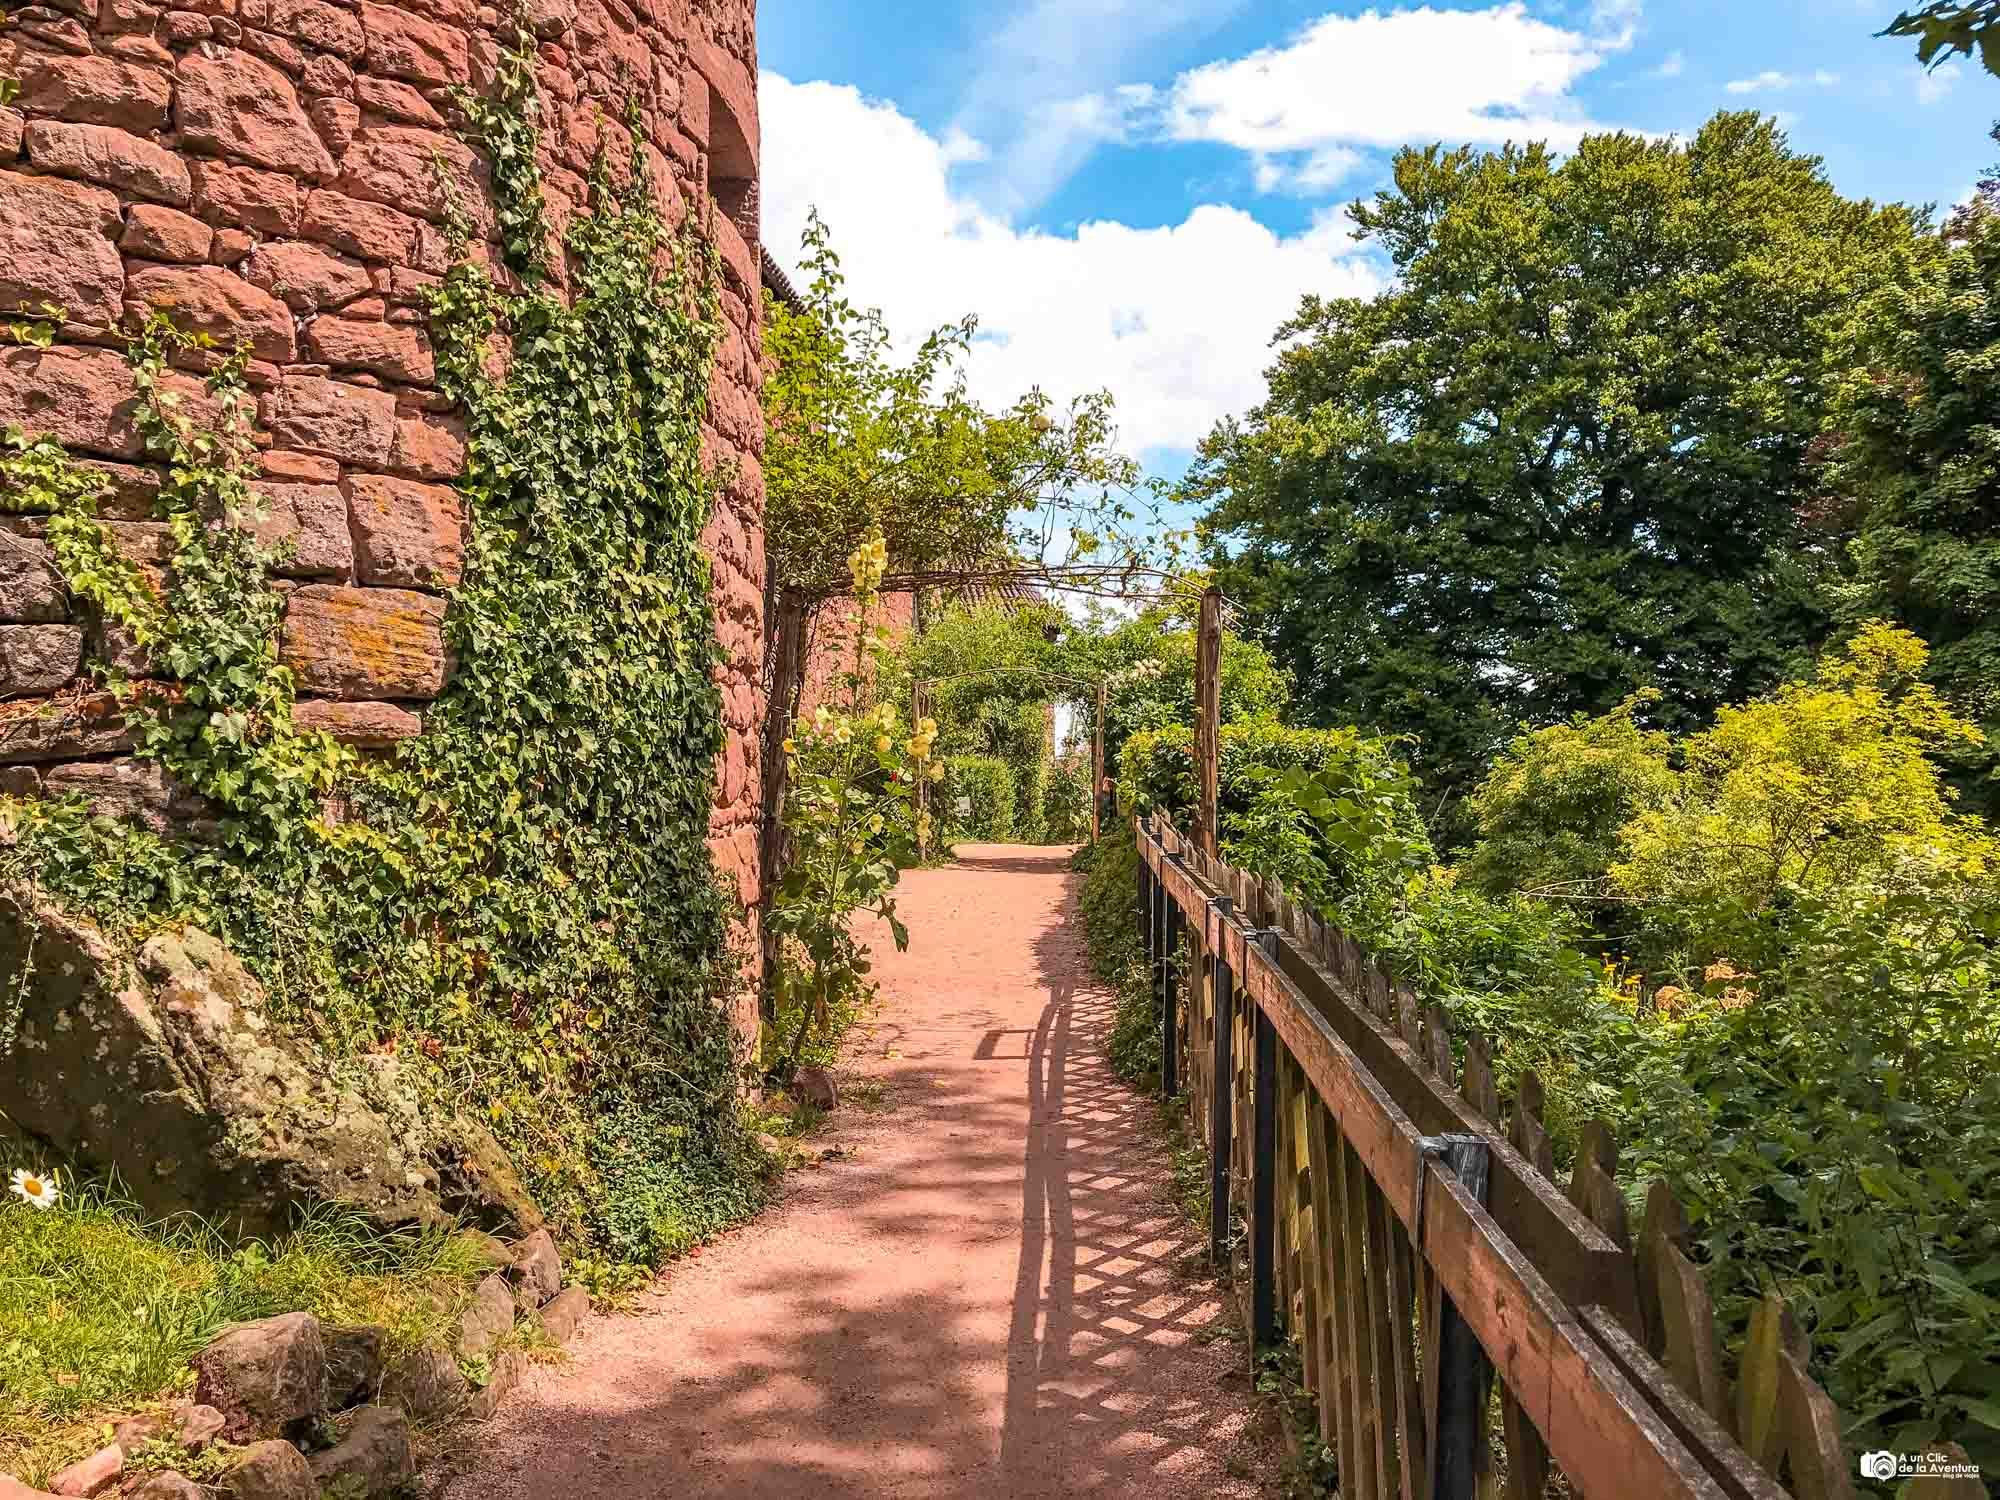 Jardín medieval del Castillo de Haut-Koenigsbourg